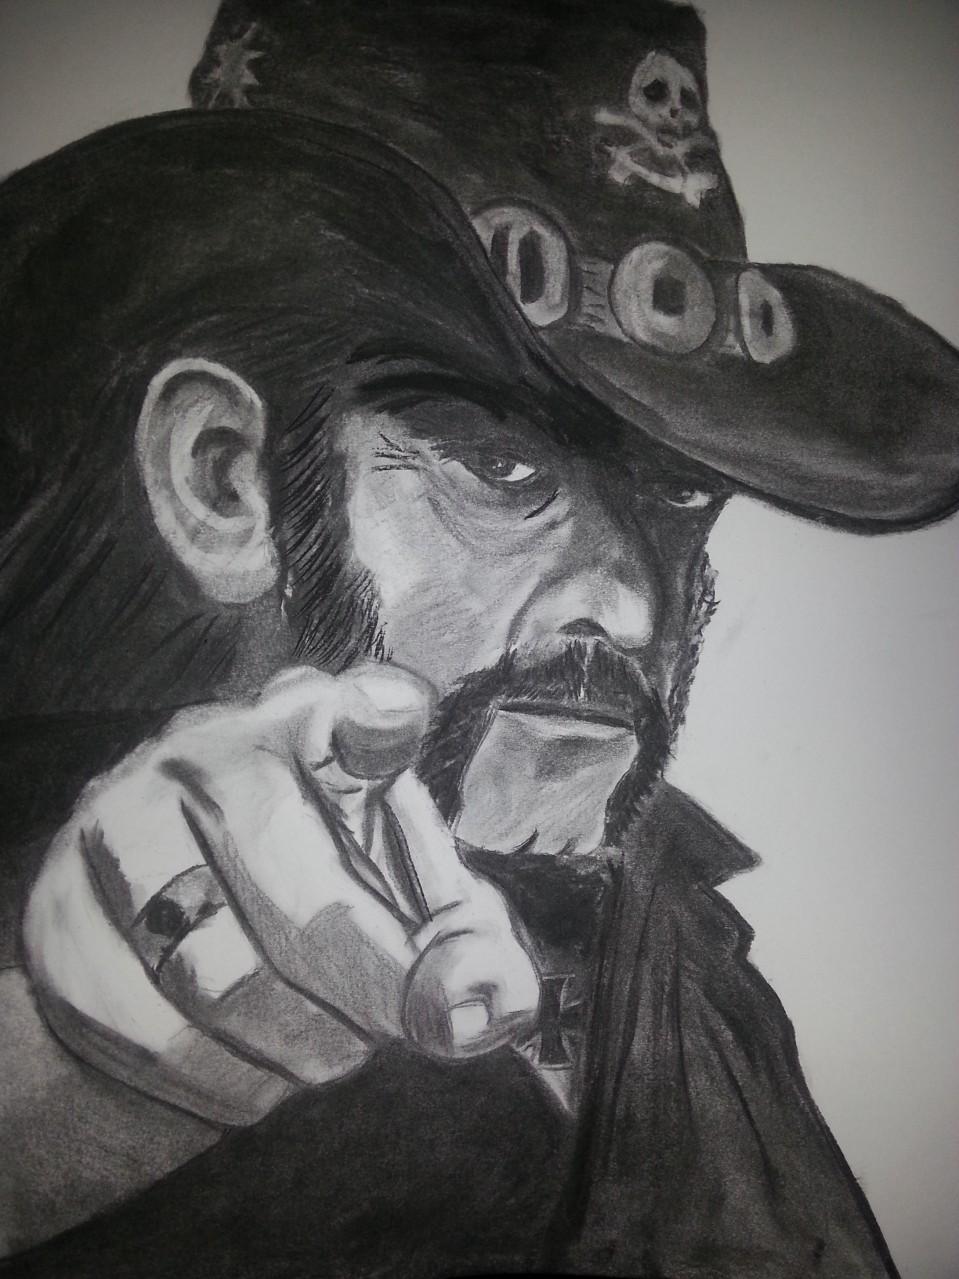 Lemmy Kilmister Motörhead Charcoal By Nephara 2014